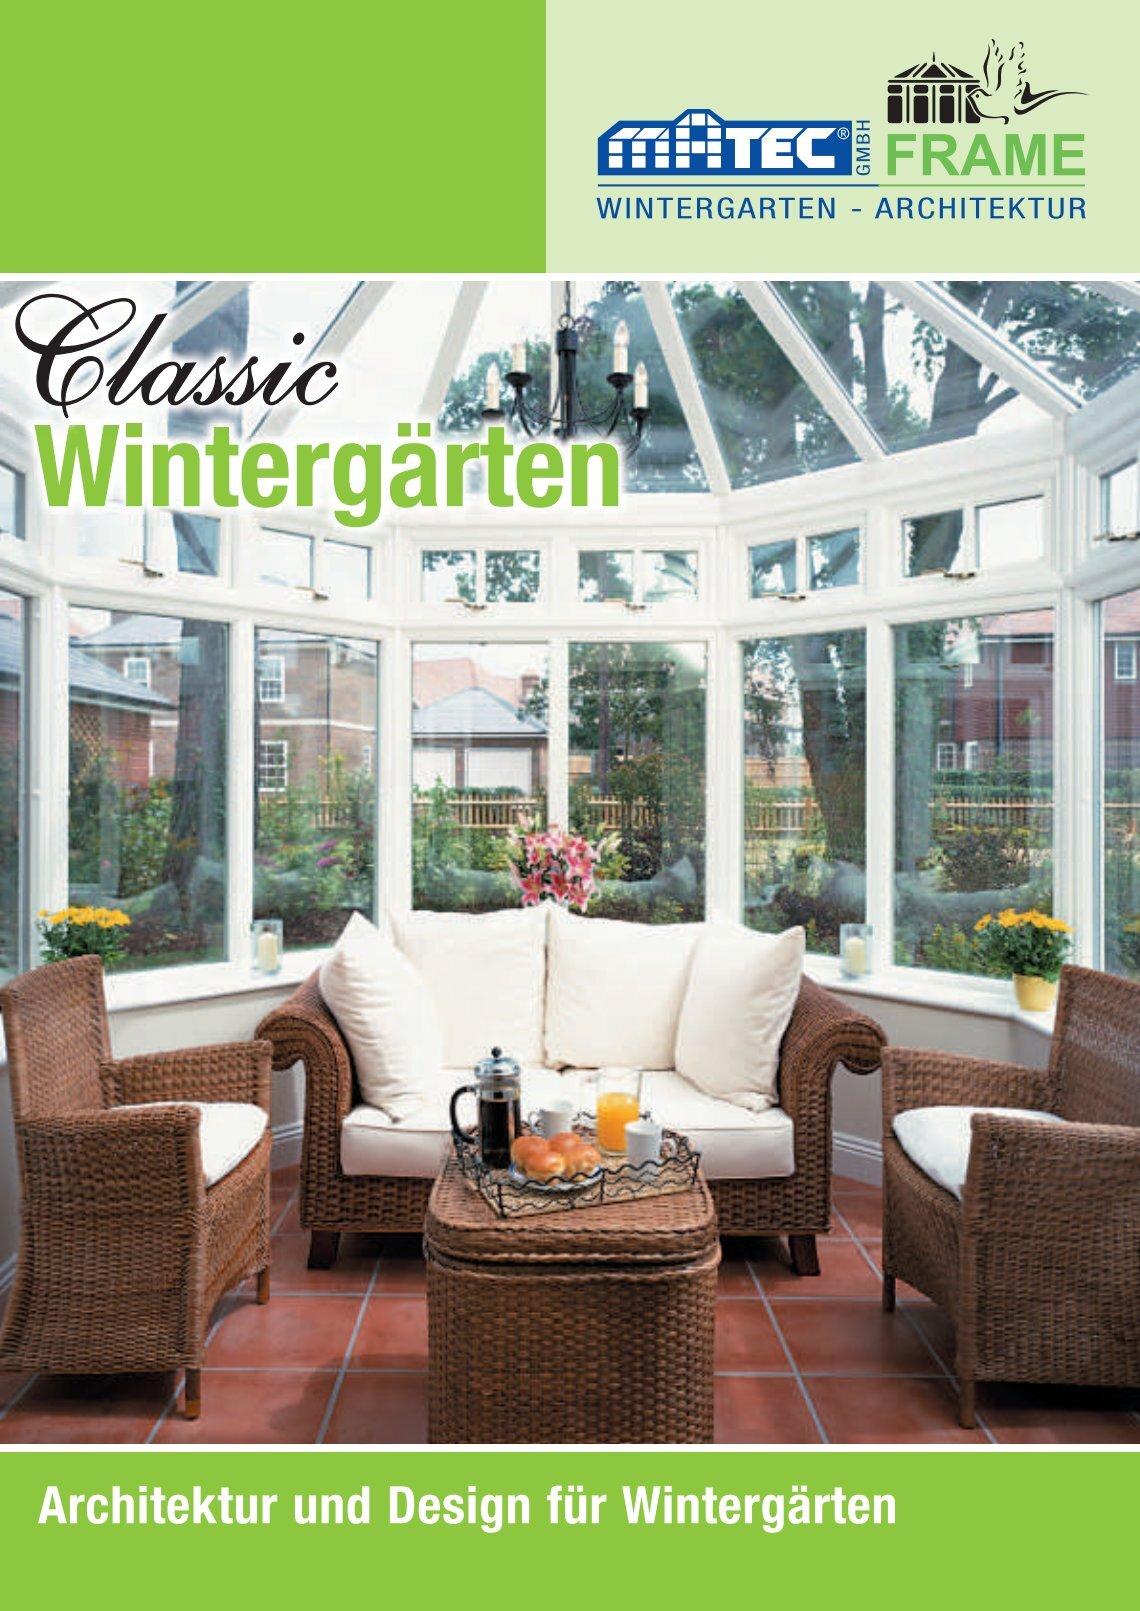 Wintergarten Ahaus 2 free magazines from matec ahaus de